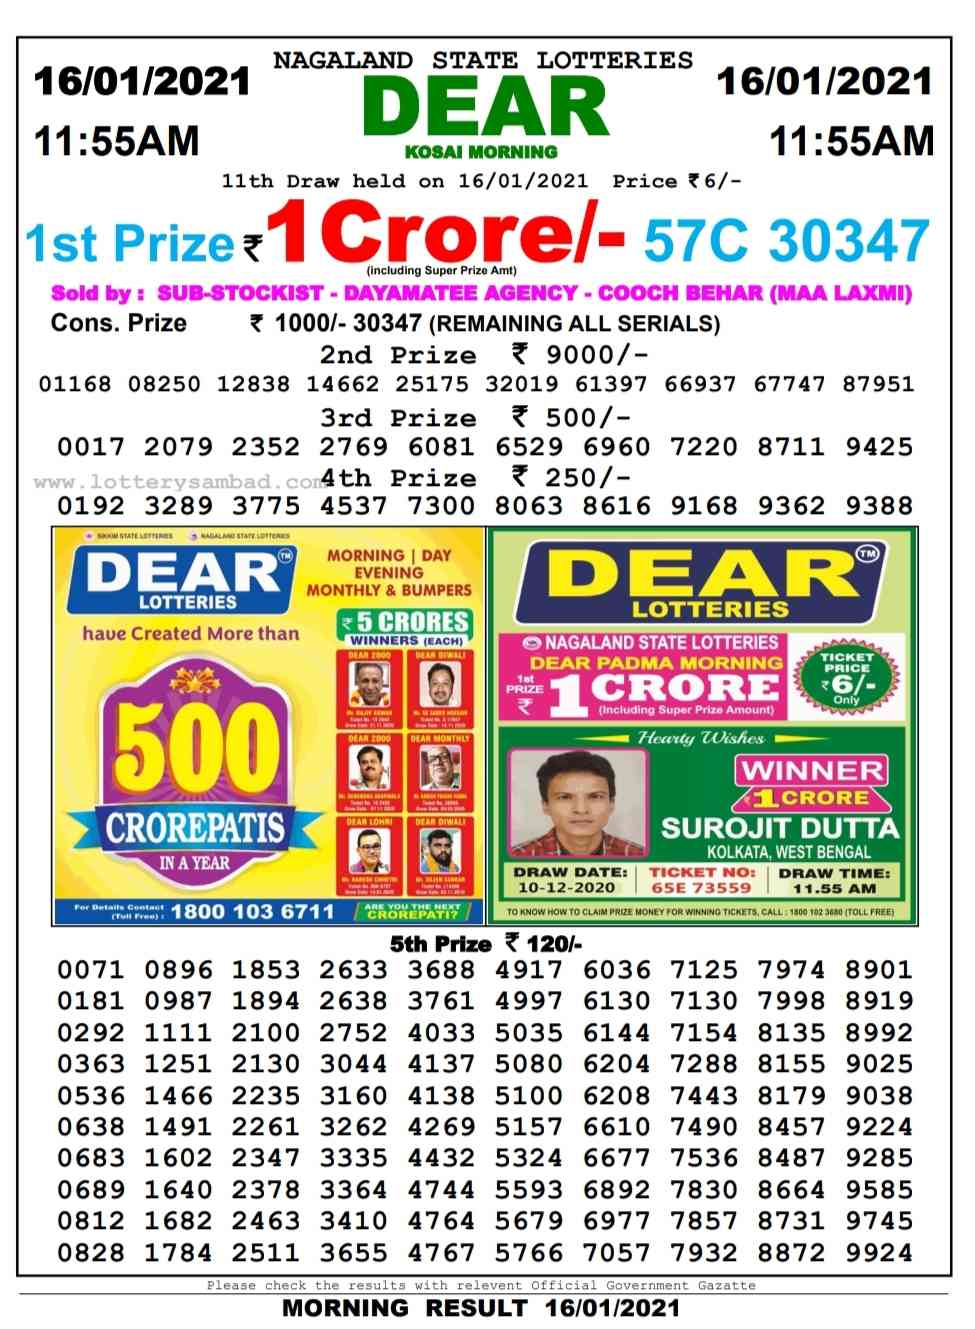 Sikkim Lottery Sambad 11.55 AM Result on 16.1.2021